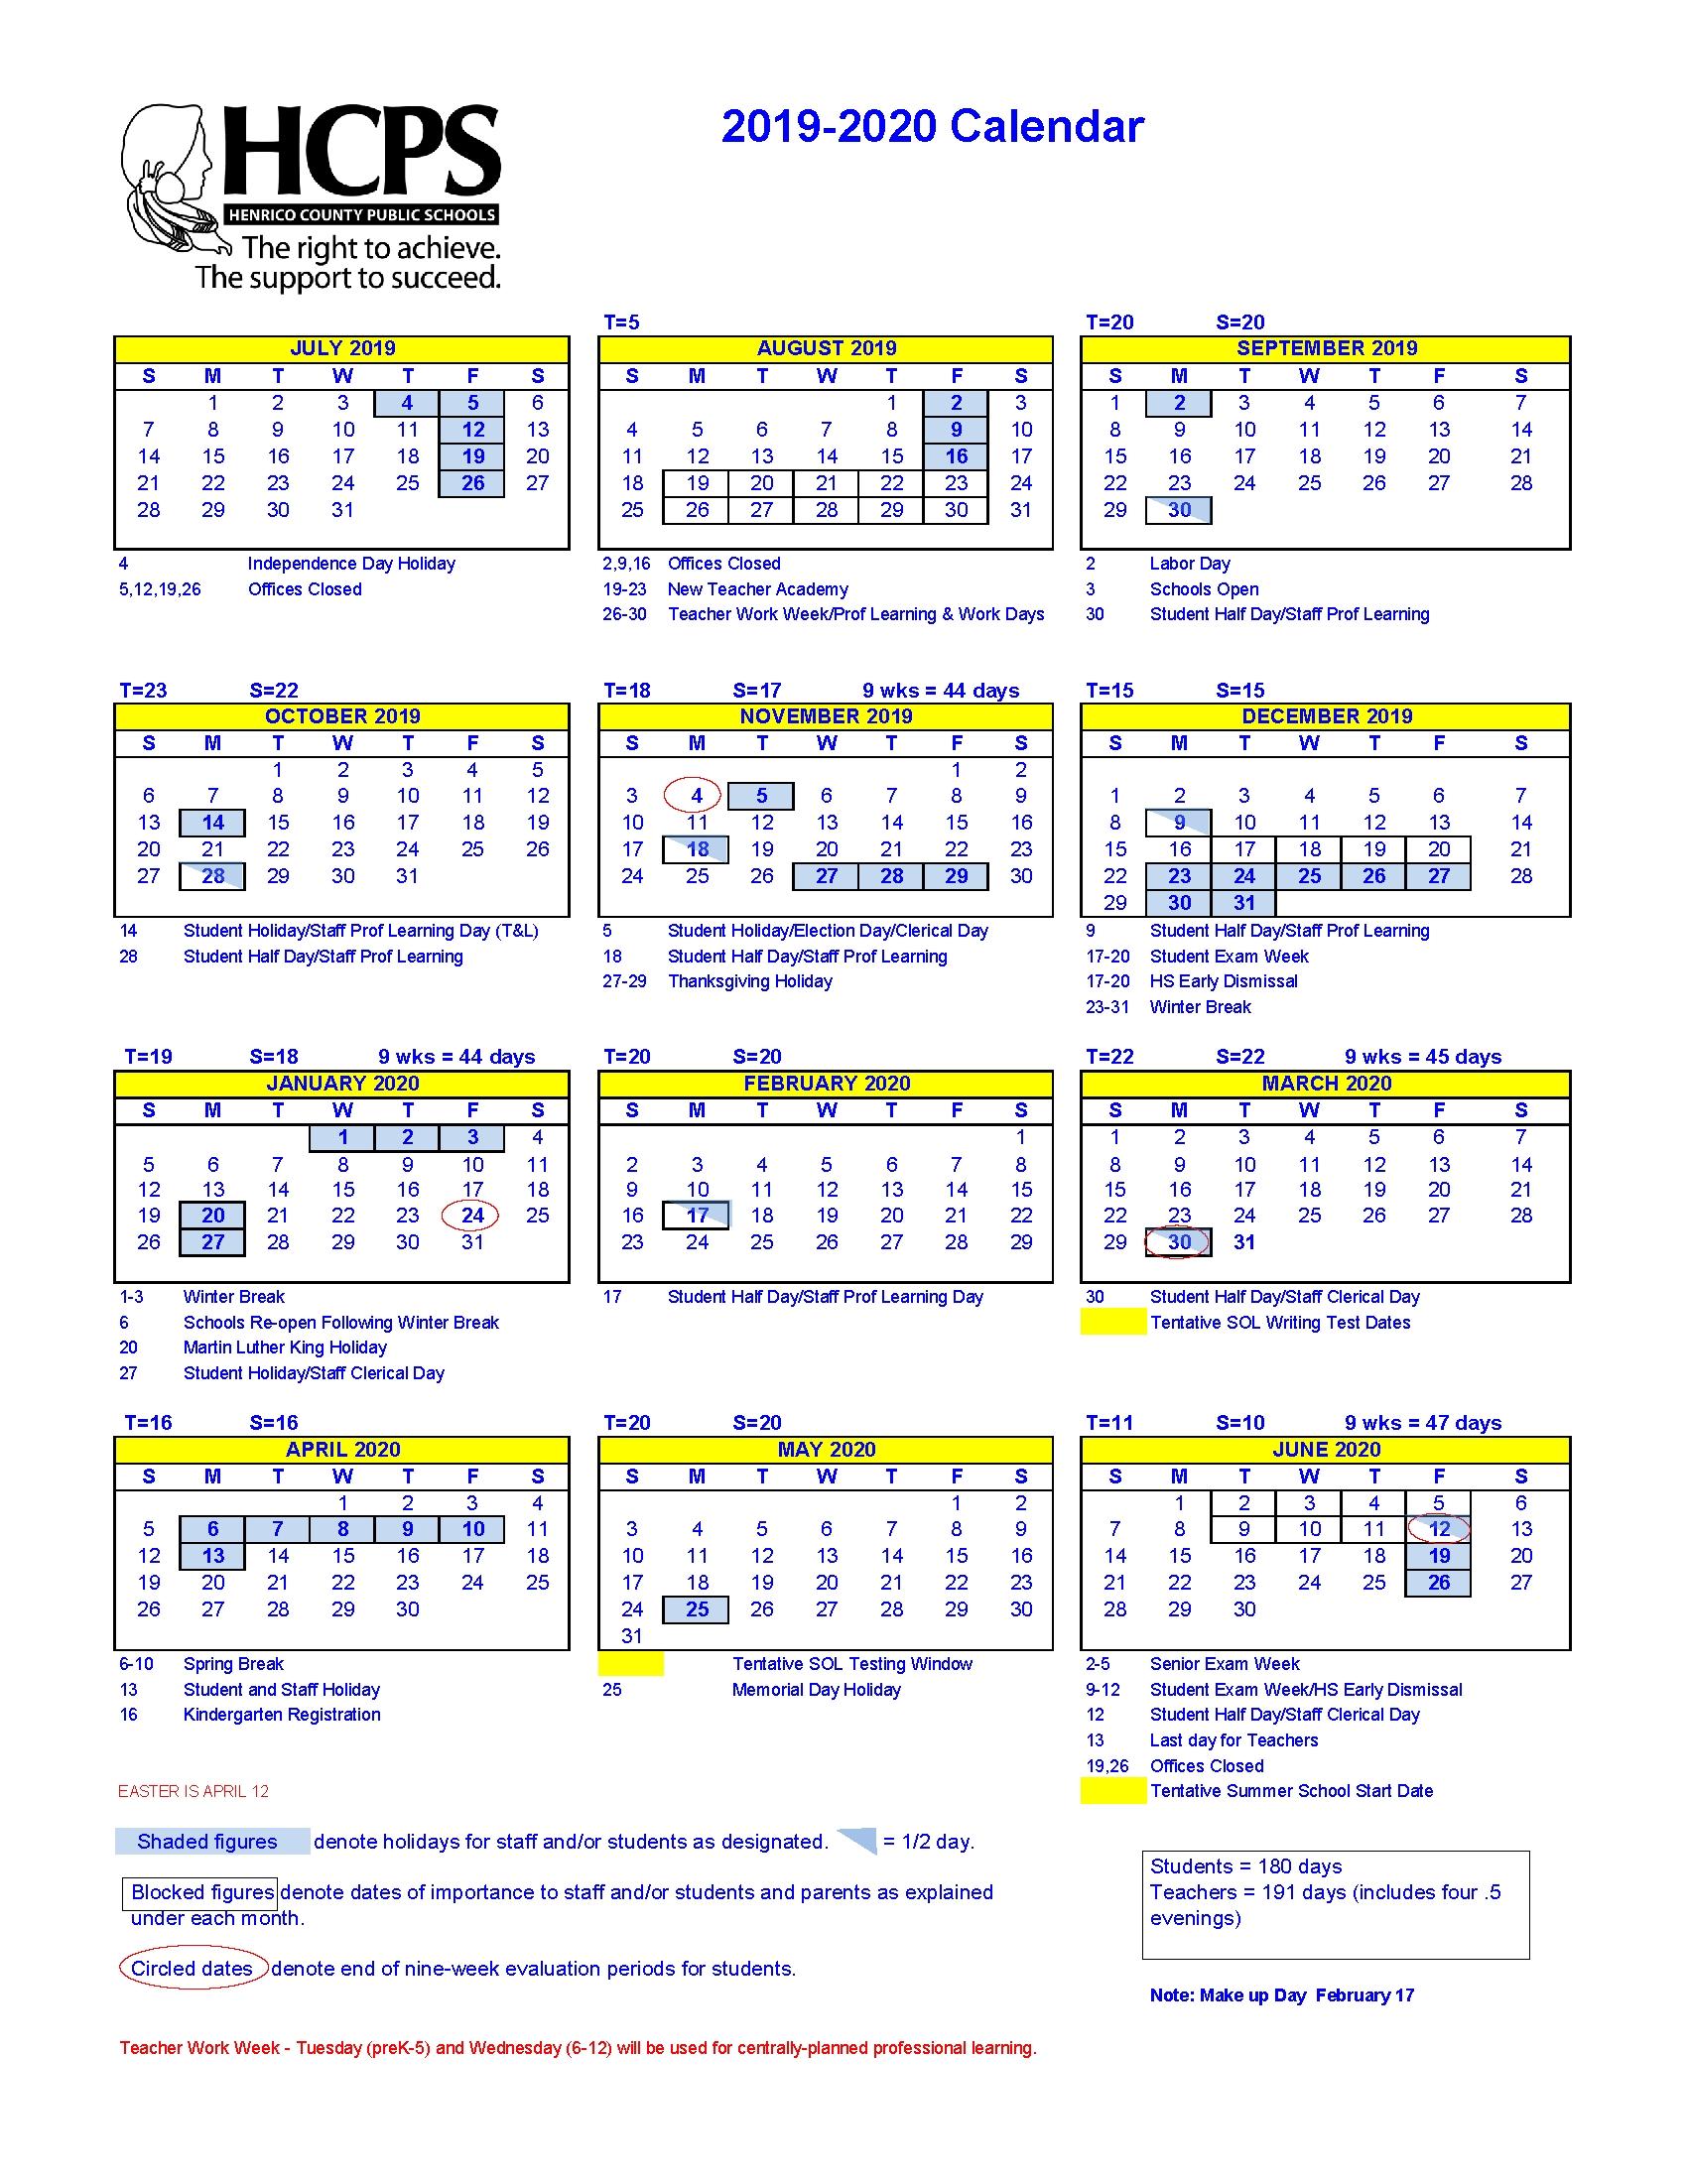 2019-20 Henrico County Public Schools Calendar – Approved – Henrico Exceptional 9 Week School Calendar